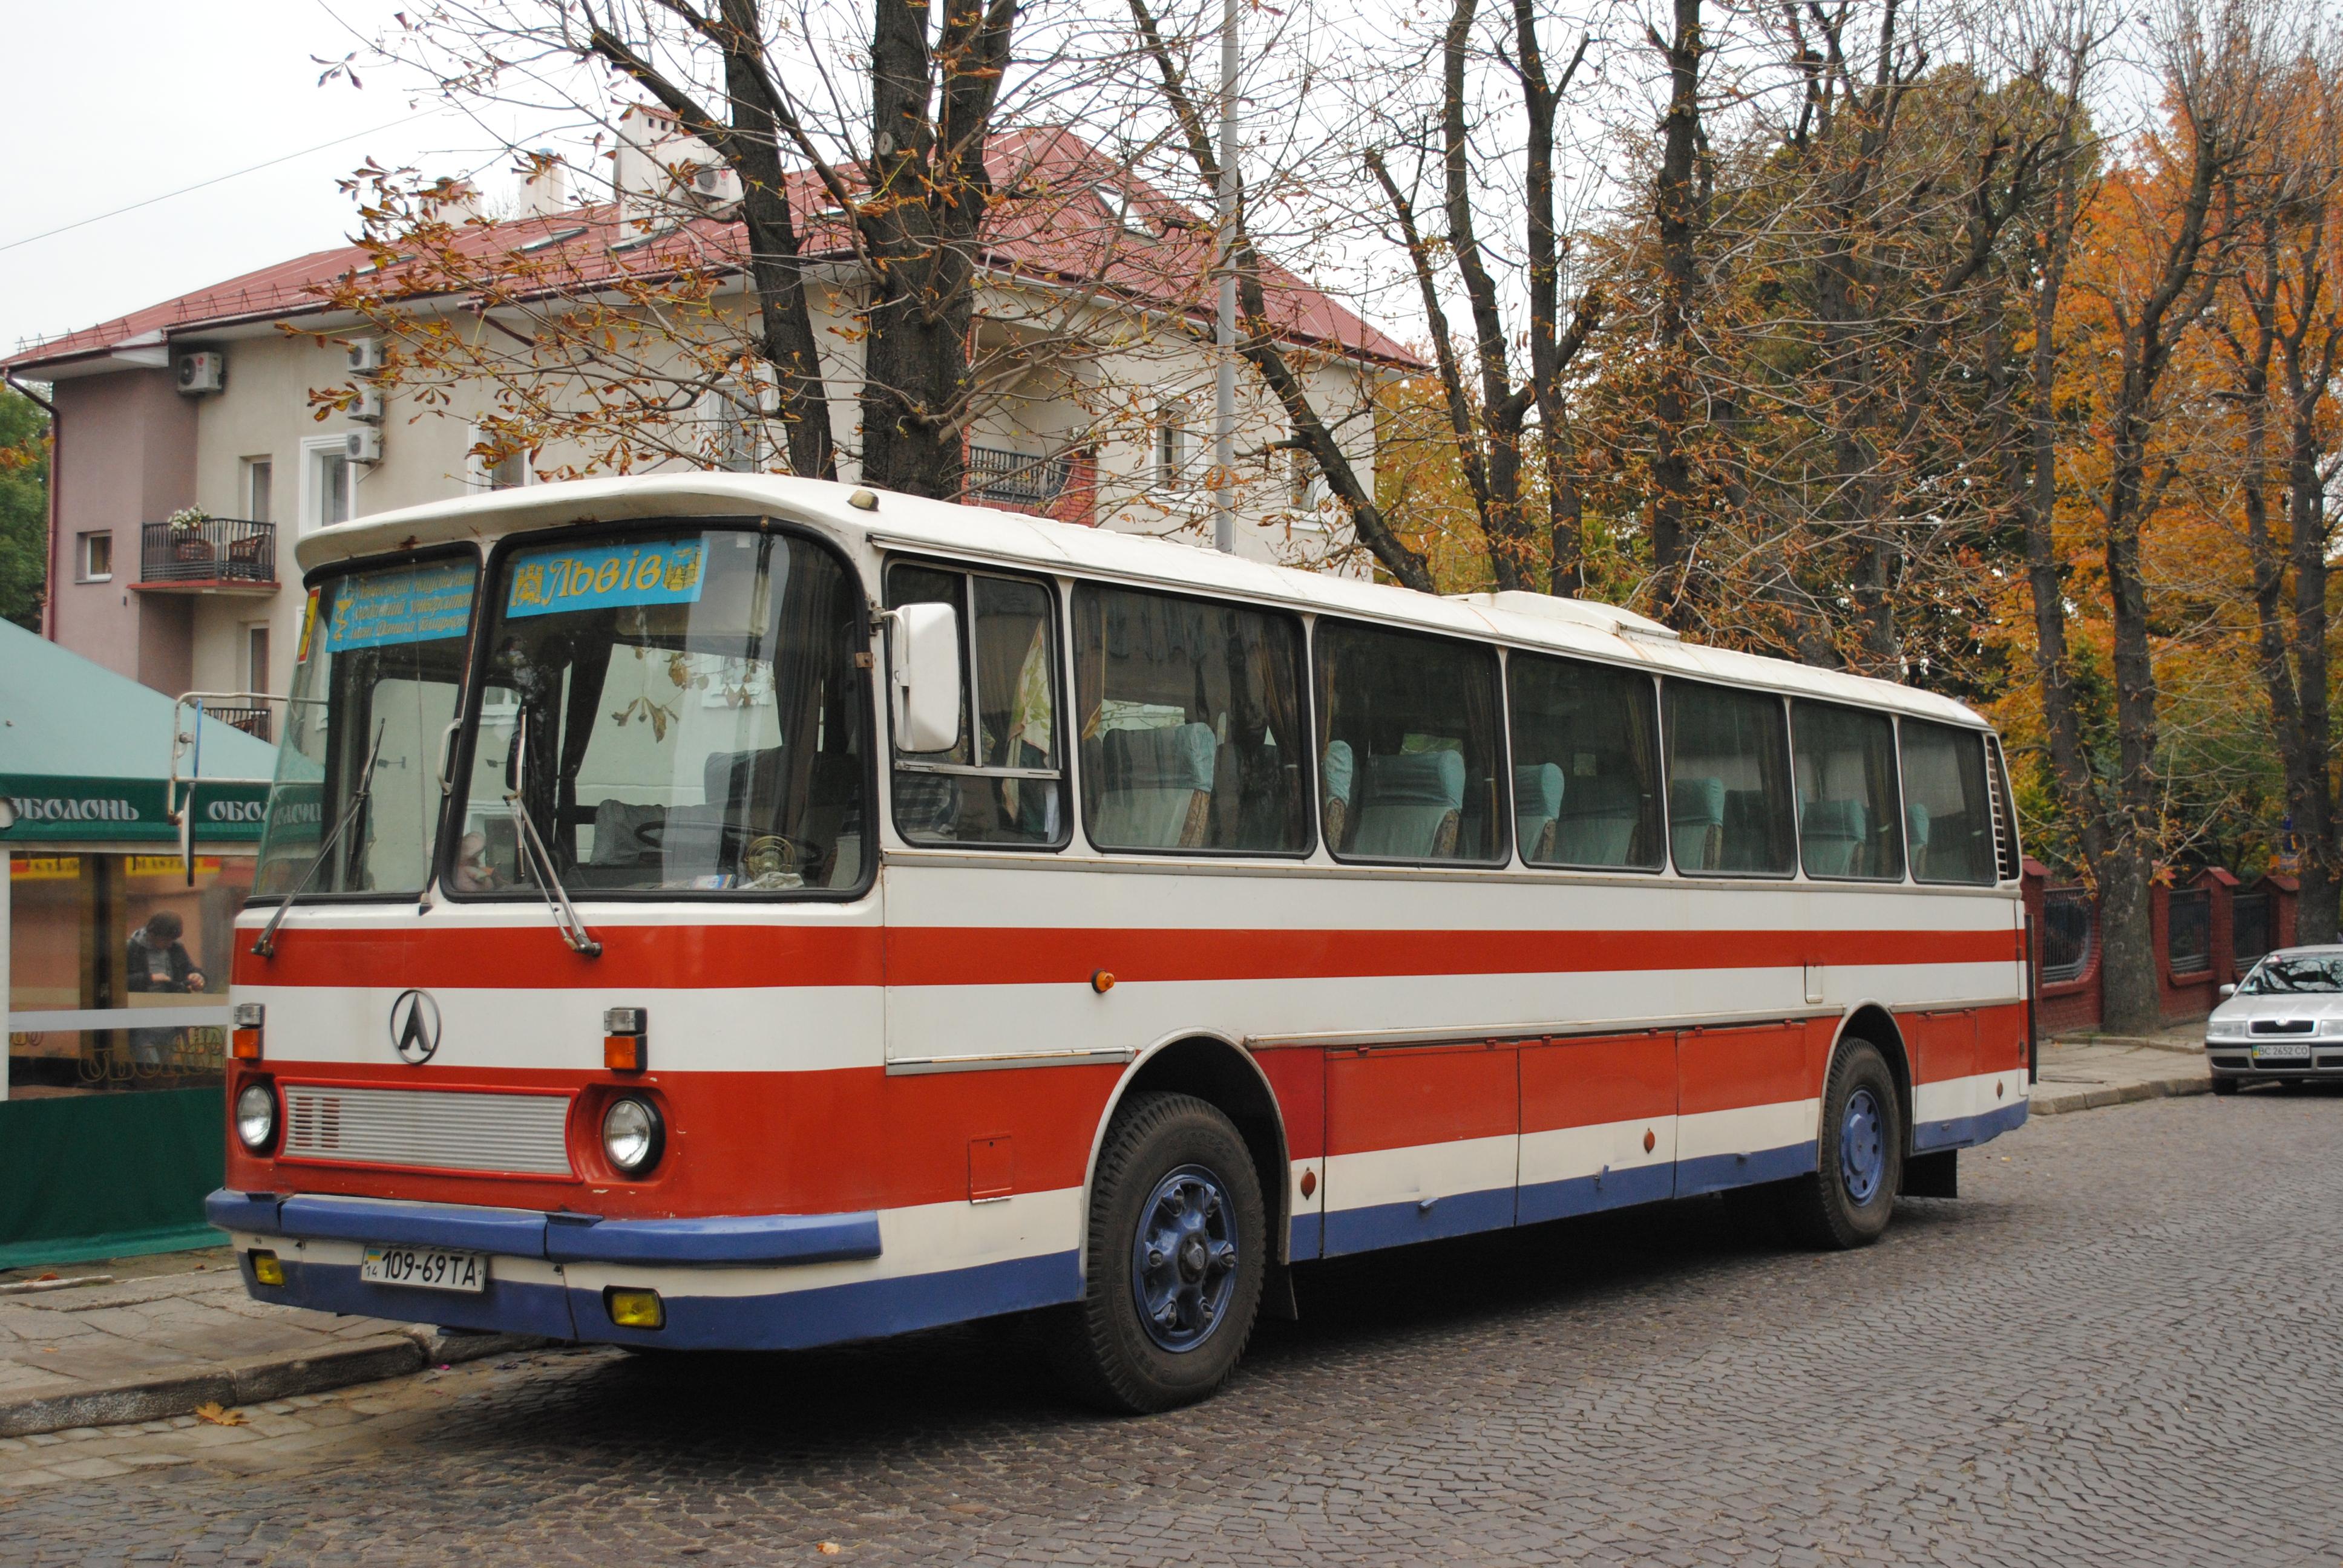 File:LAZ-699 (Lviv Medical University) - 1.jpg